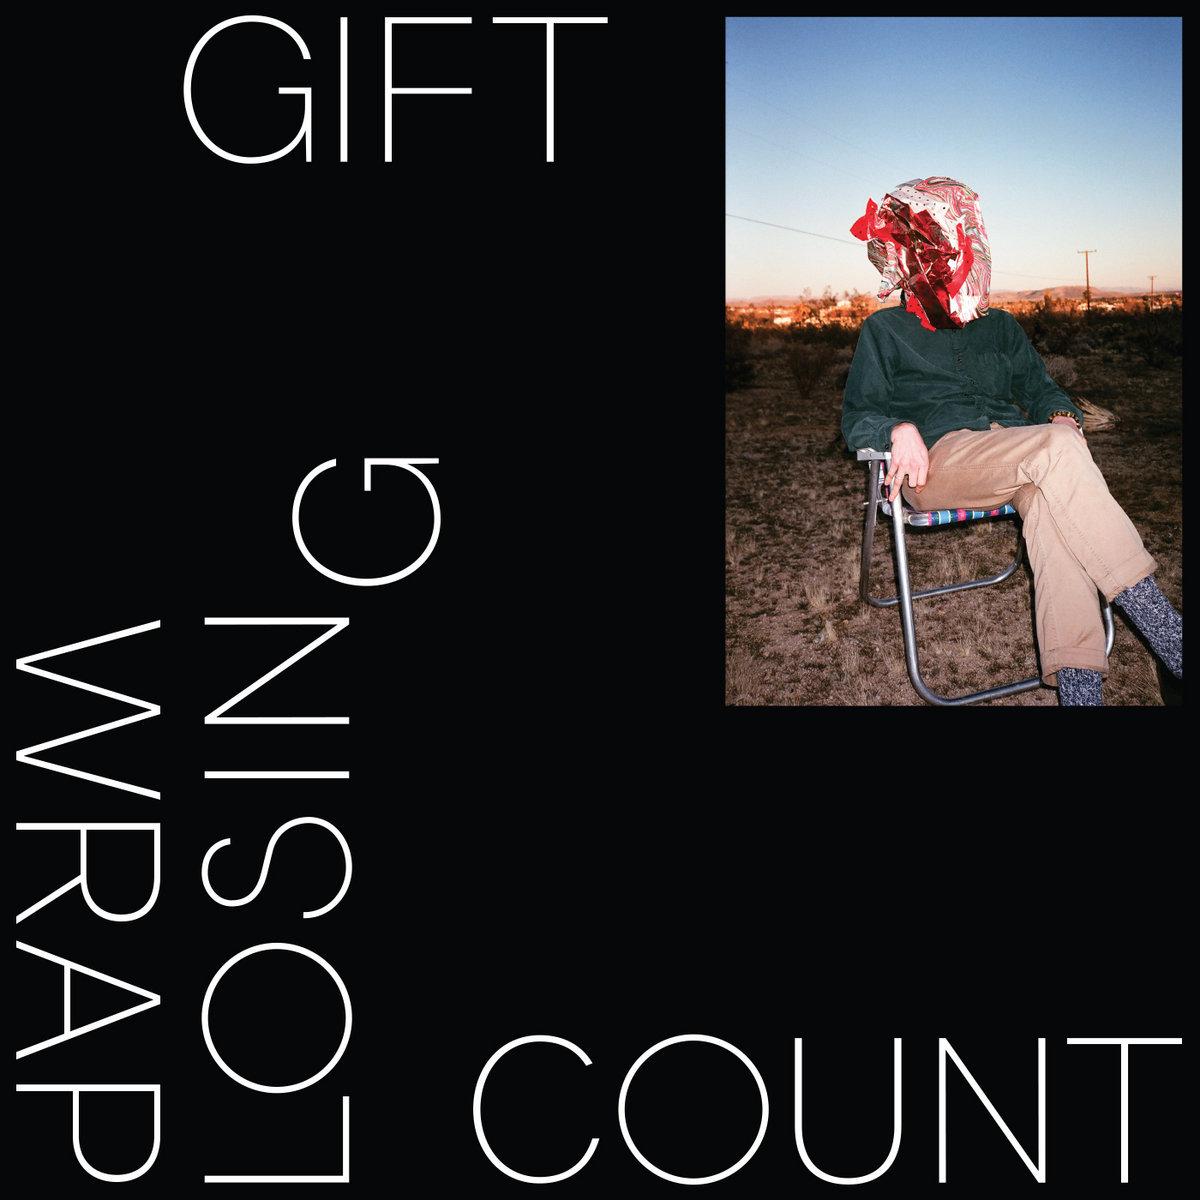 Gift Wrap / Losing Count(150 Ltd Cassette)